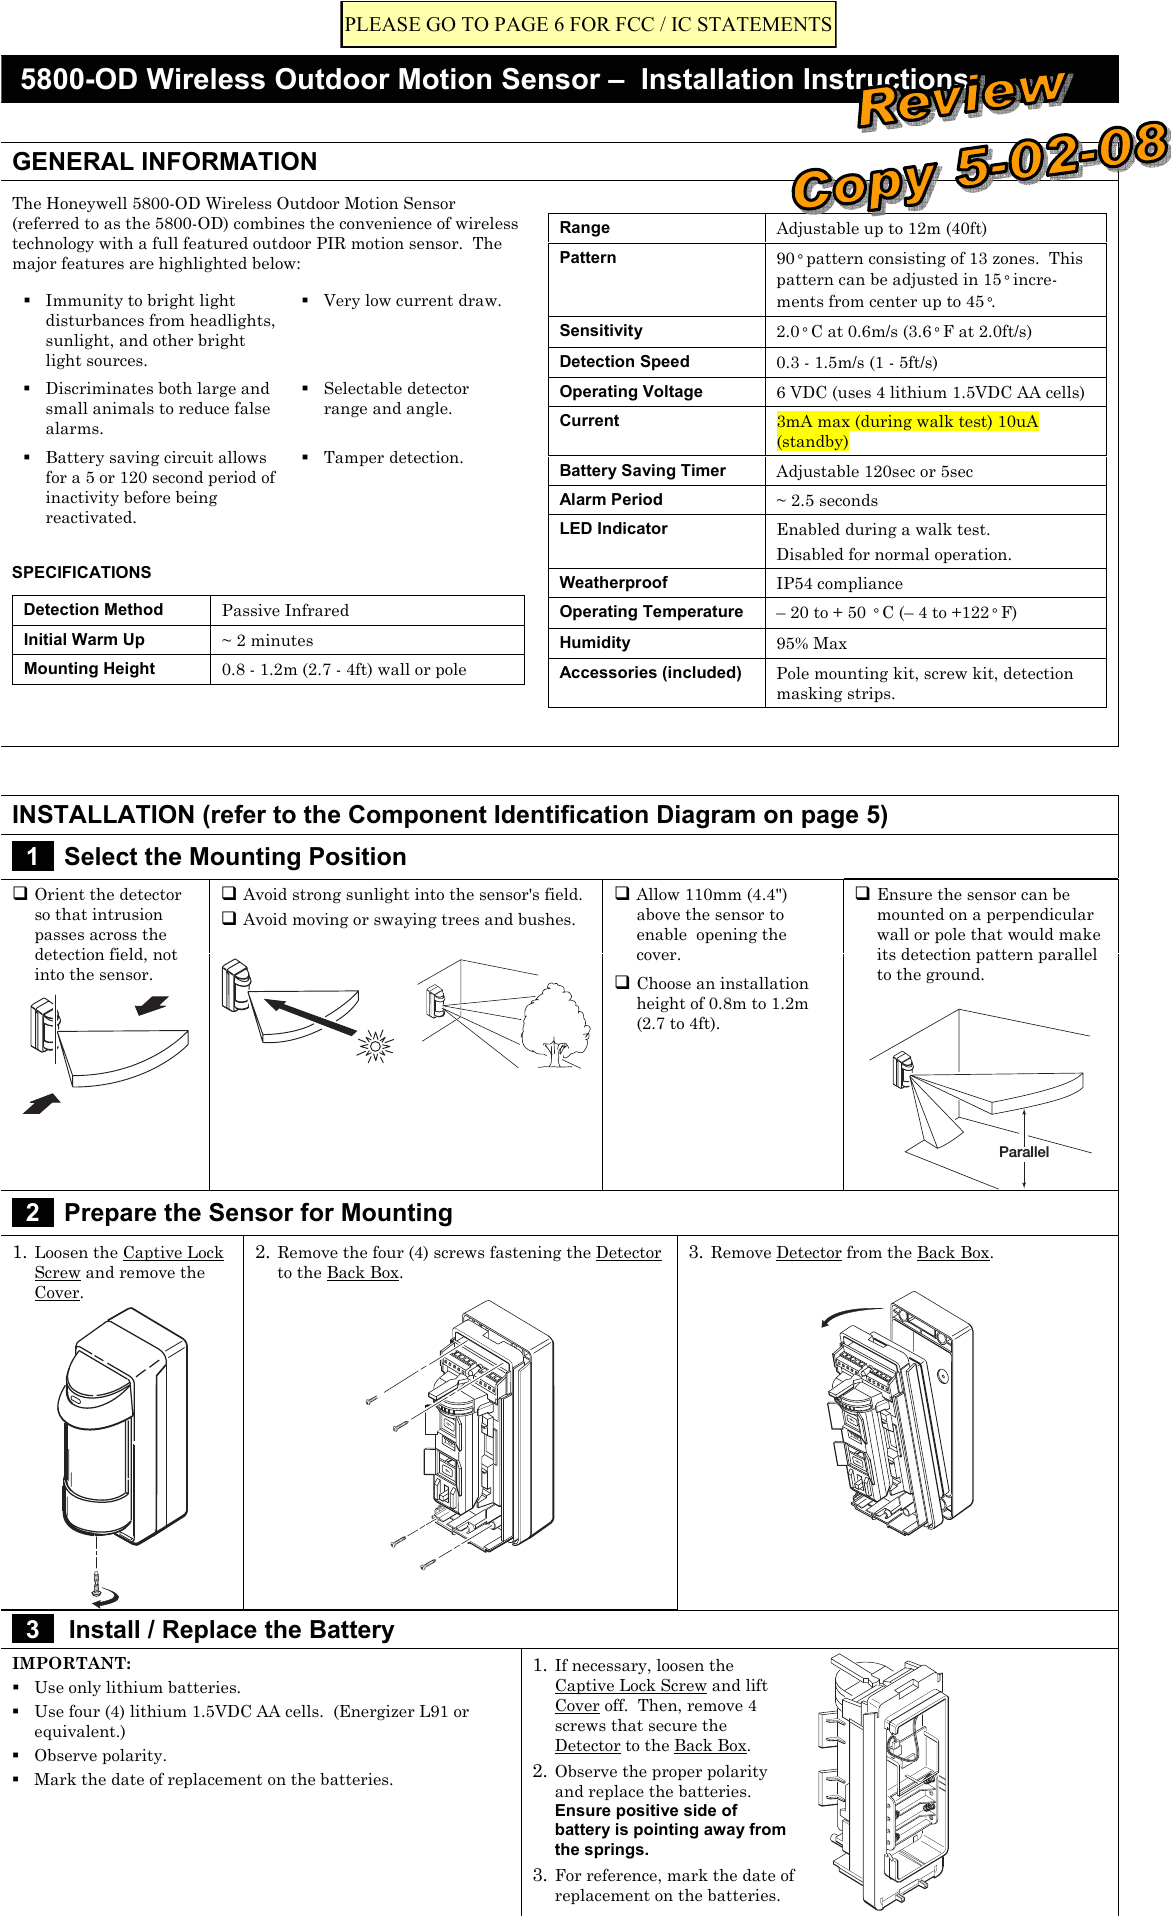 8dl5800pir od security transmitter user manual 5890 od wireless outdoor motion sensor honeywell